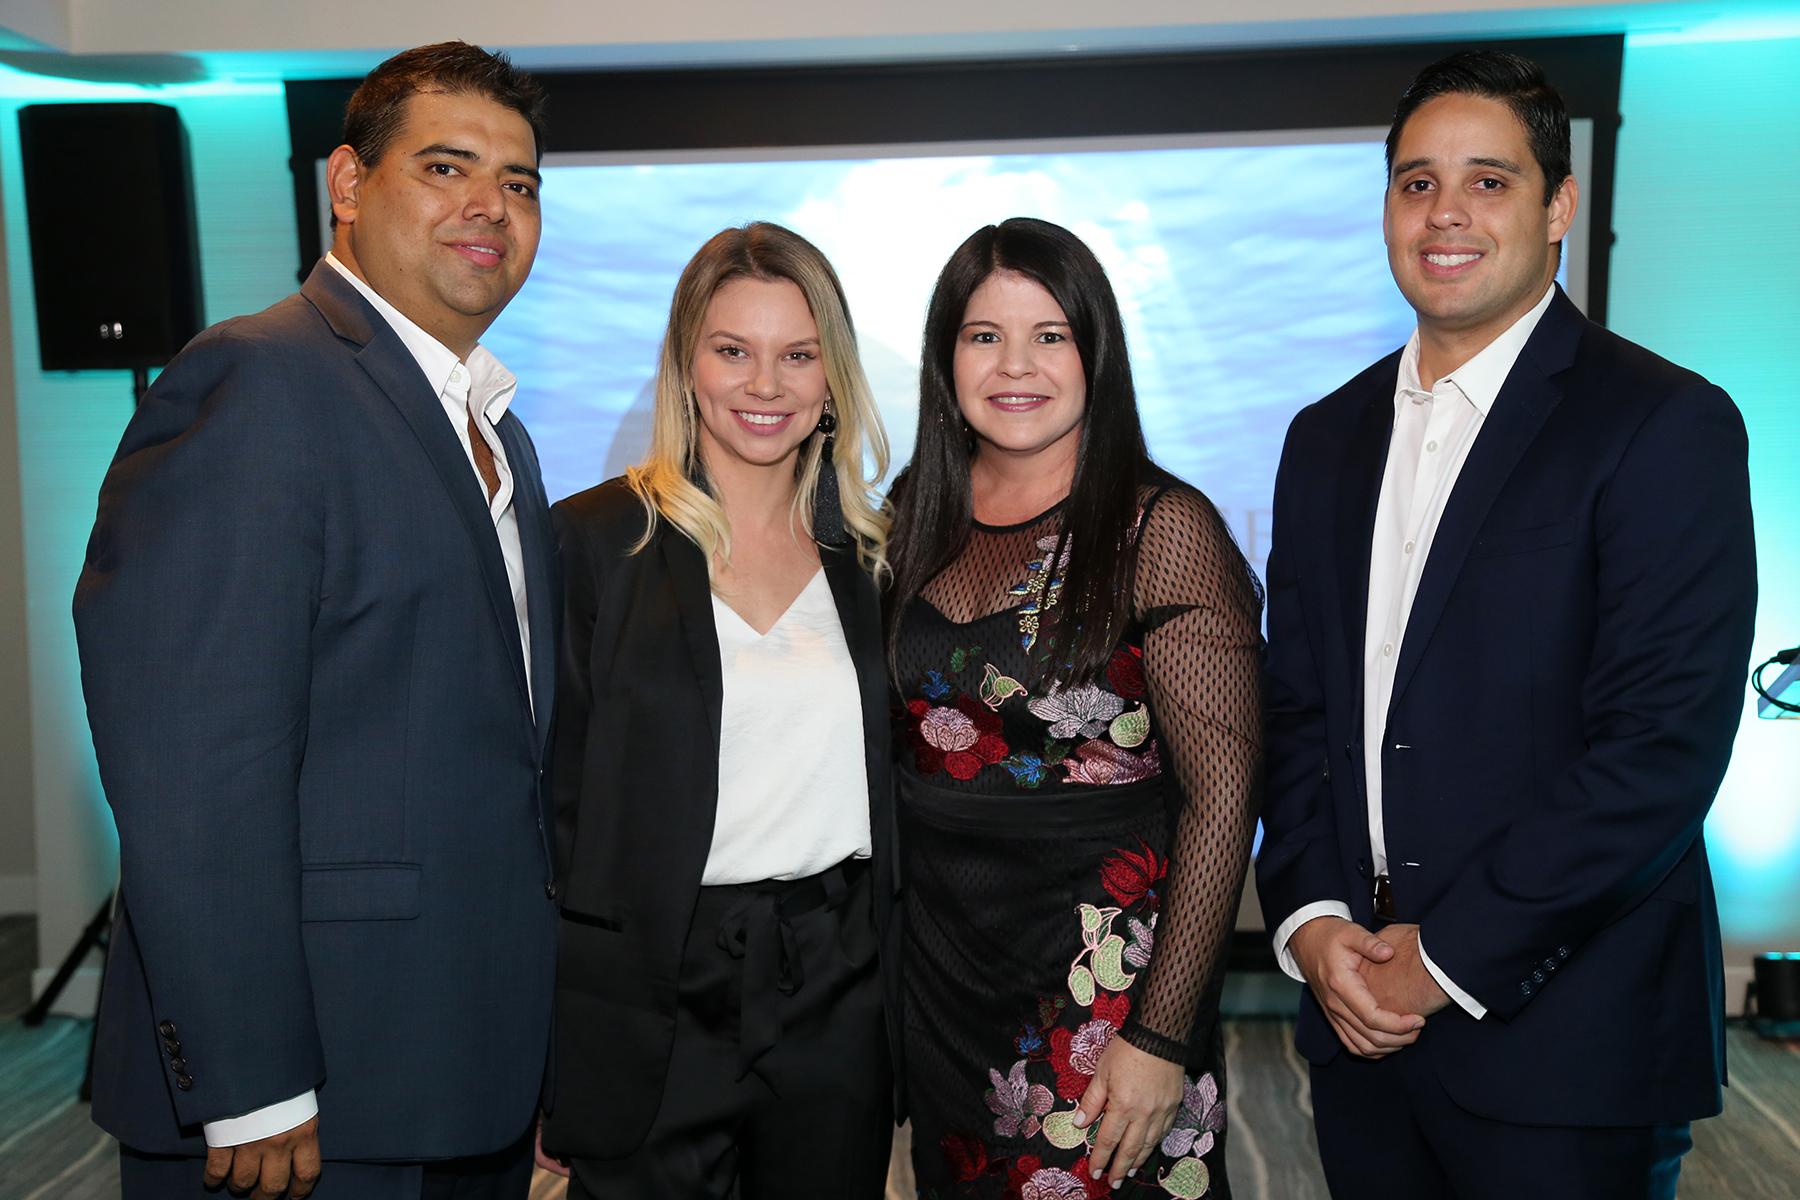 Rudy Vásquez, Carmen Santamaría, Karen Negrón y Guillermo Sosa. (Nichole Saldarriaga)